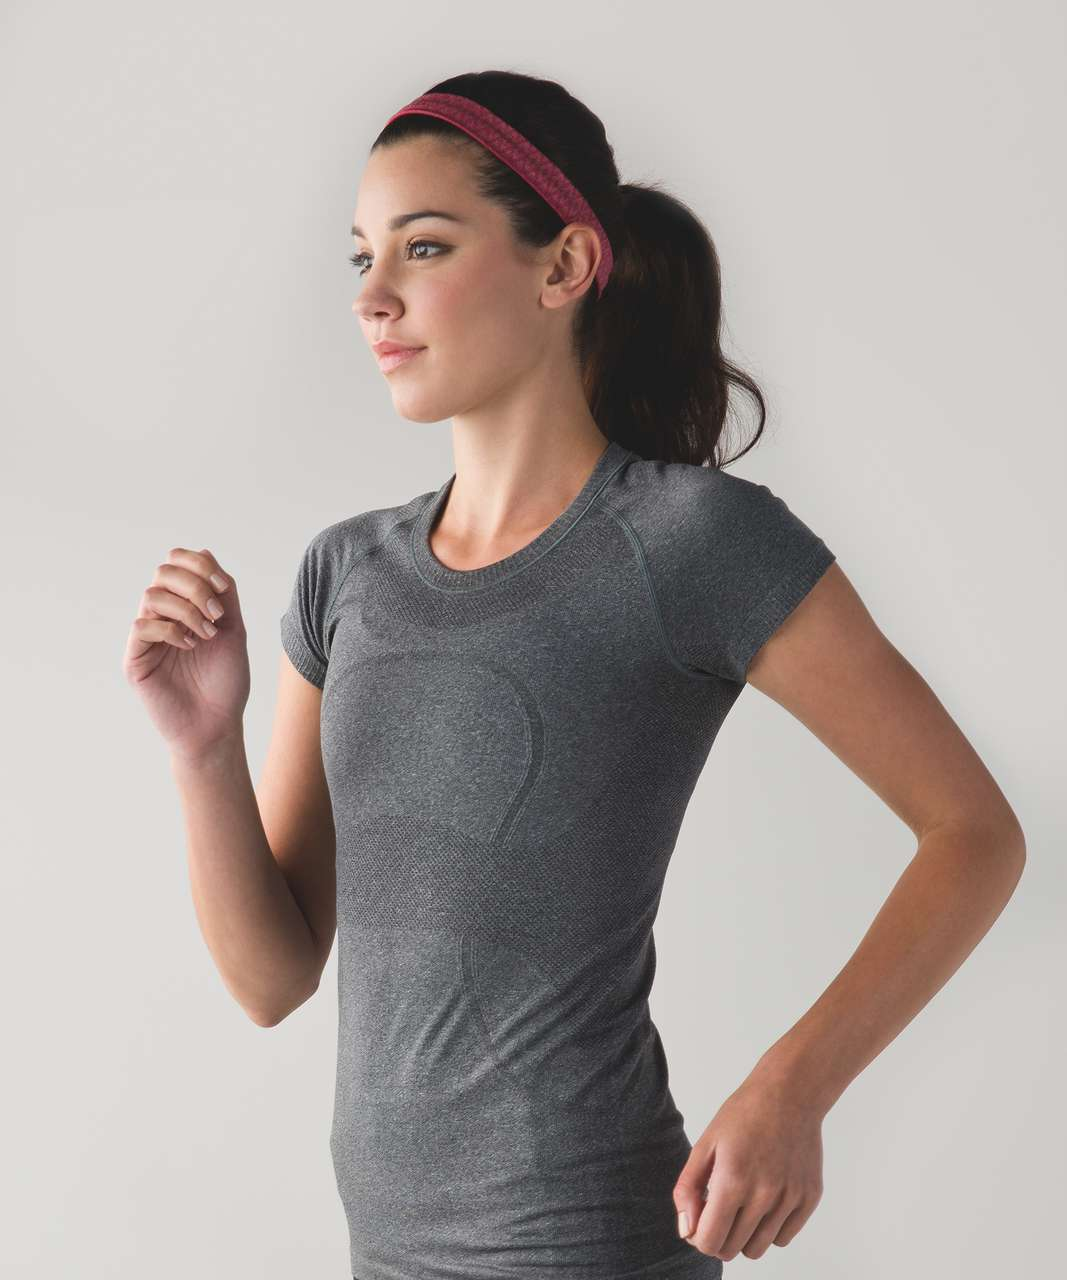 Lululemon Cardio Cross Trainer Headband - Heathered Cranberry